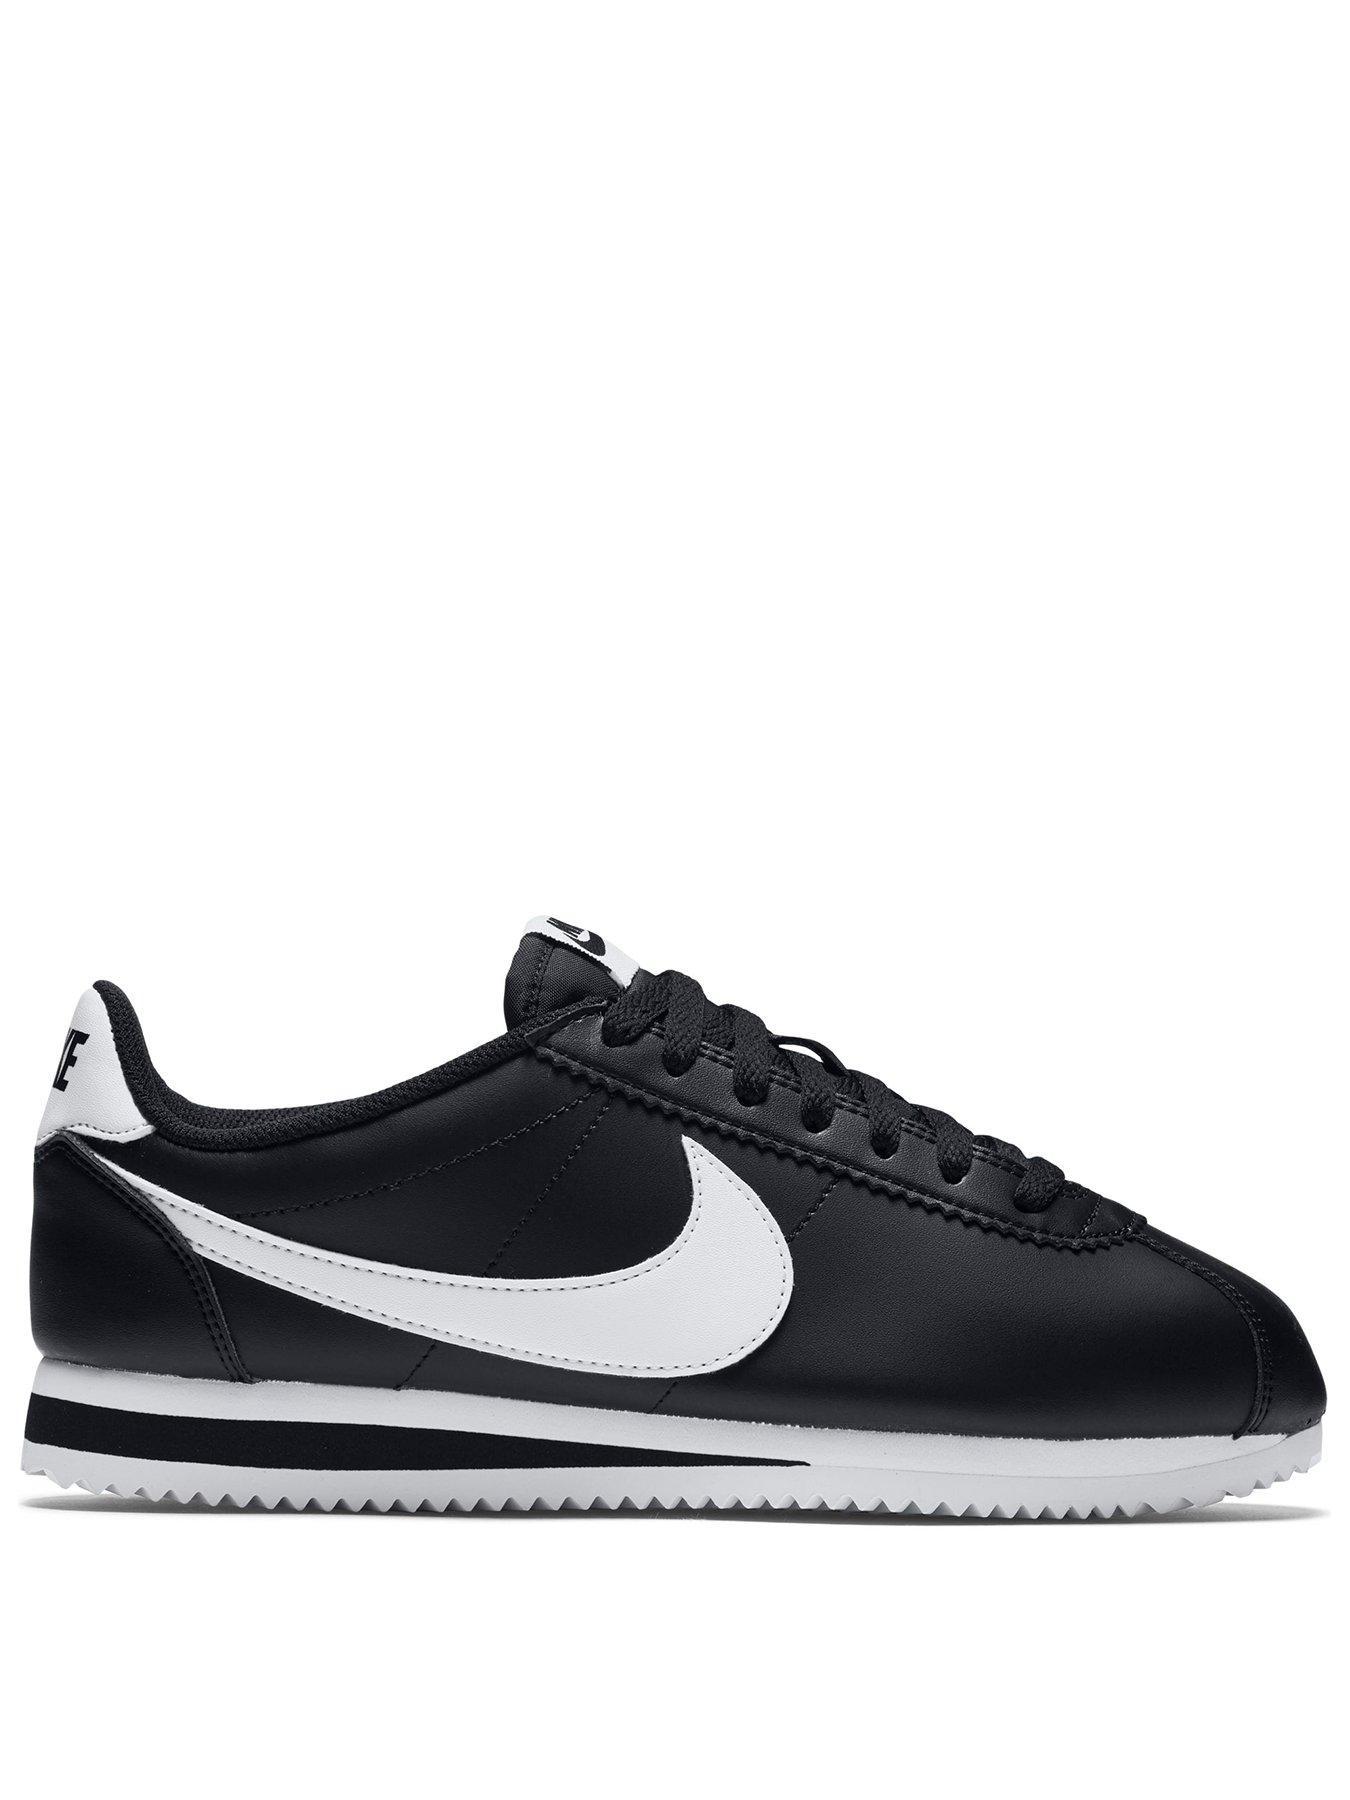 low priced fa91c 421ba ... nike classic cortez leather